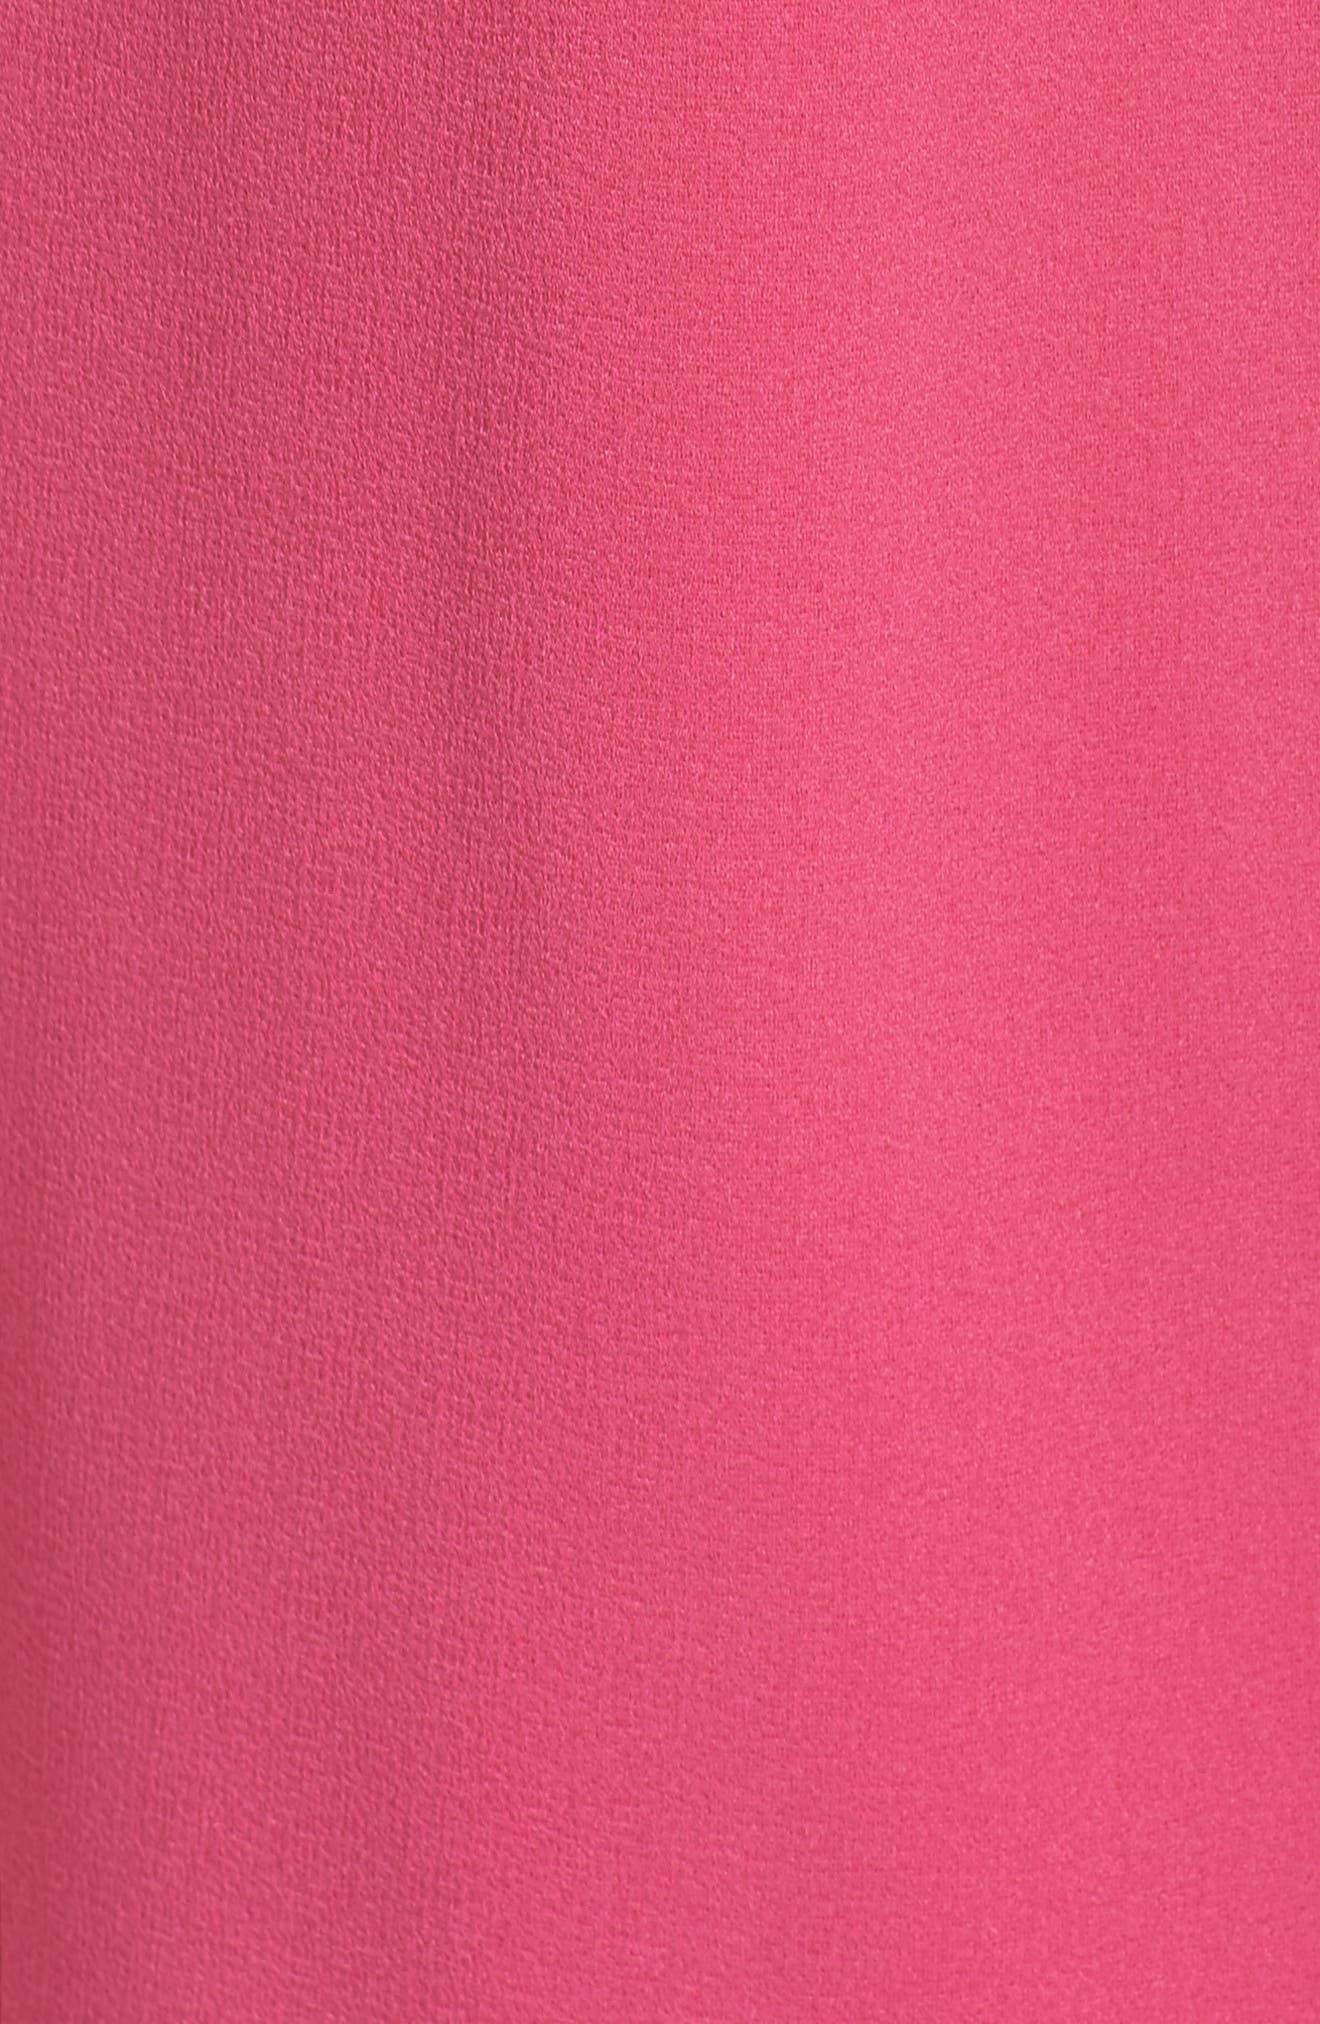 Bow Back Sleeveless Trapeze Dress,                             Alternate thumbnail 4, color,                             Magenta